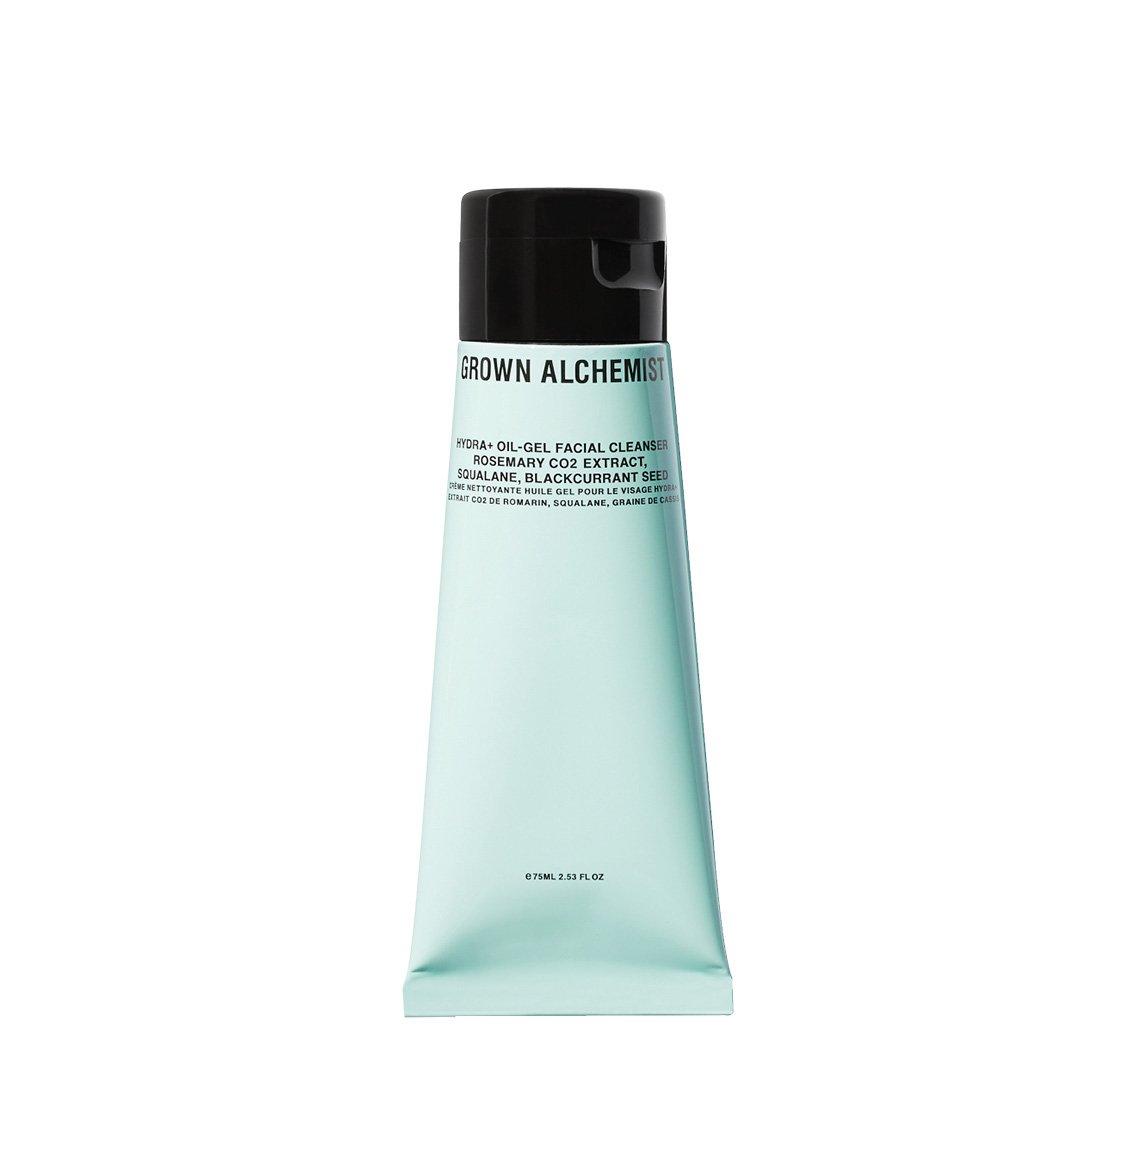 Grown Alchemist Hydra+ Oil Gel Facial Cleanser 75ml